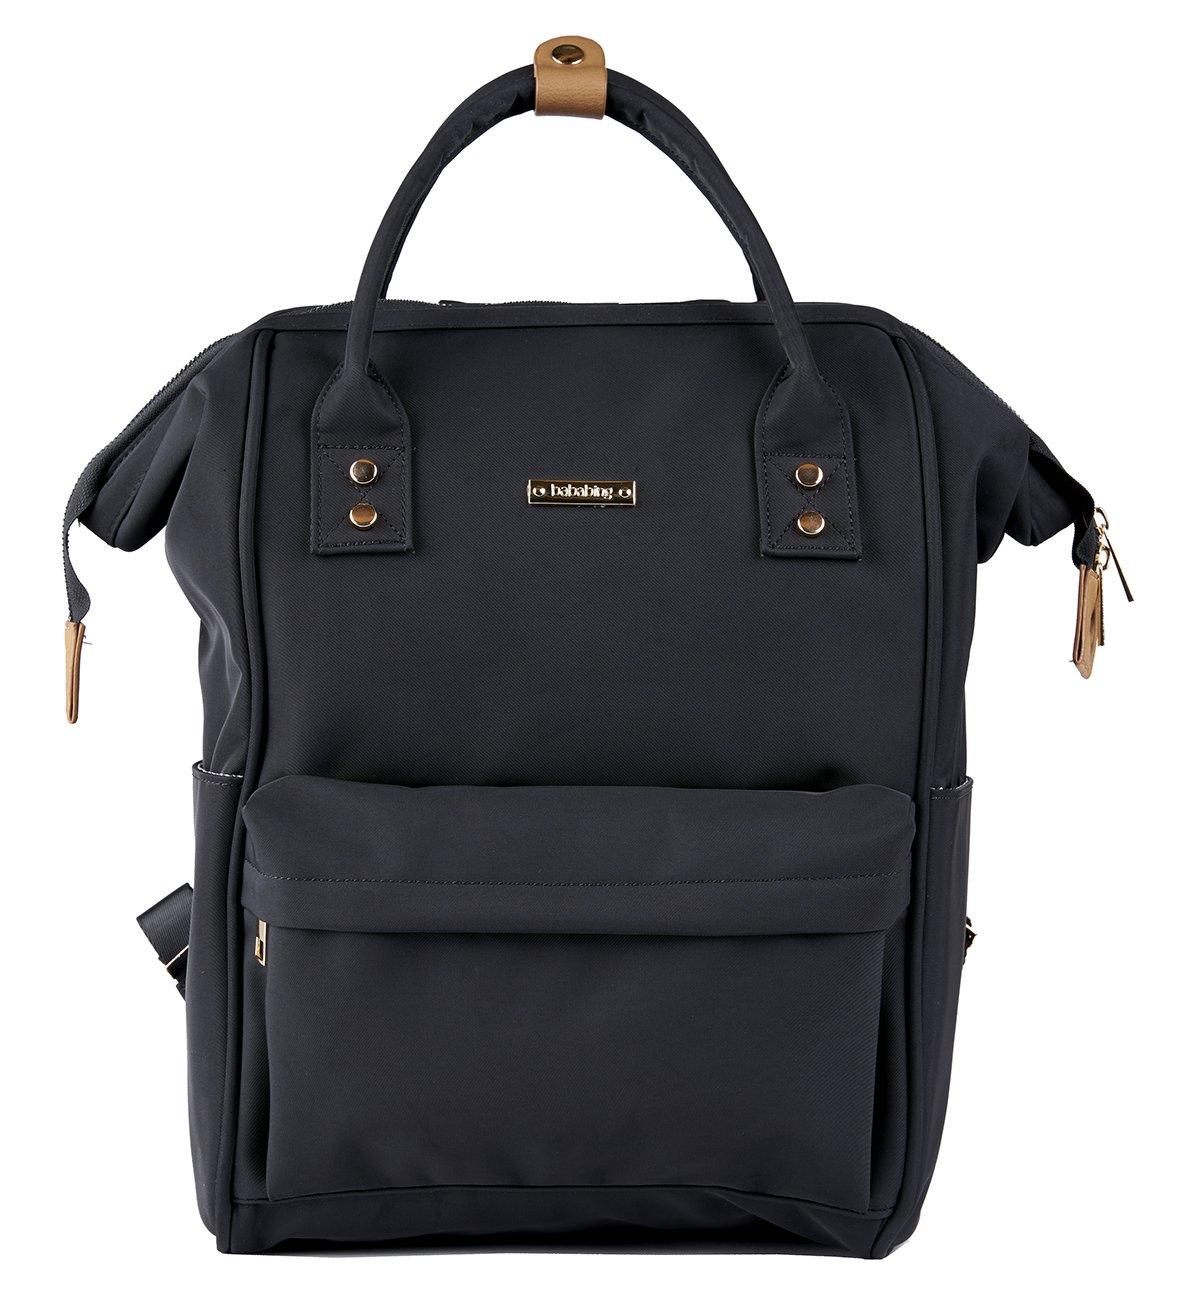 BabaBing! Changing Bag and Back Pack baba bing BB77-001